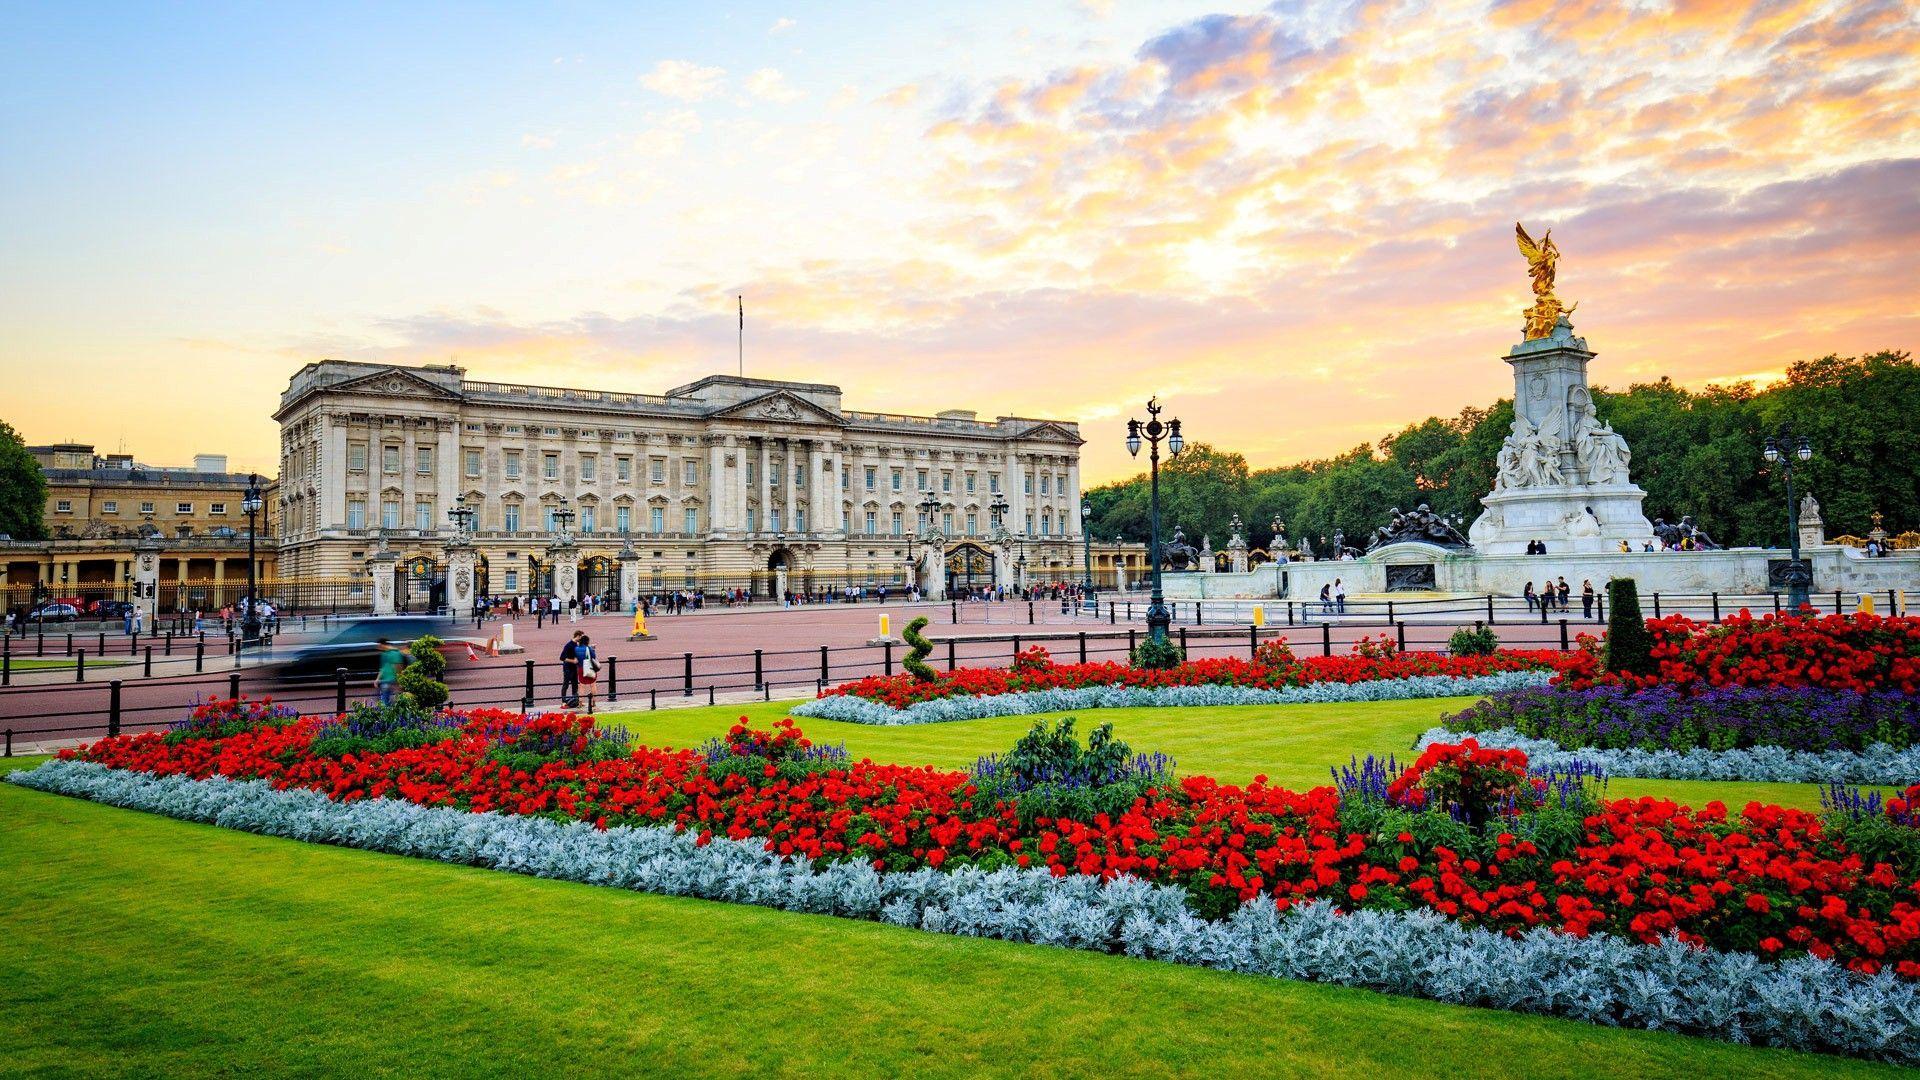 Buckingham Palace Wallpapers - Top Free Buckingham Palace Backgrounds -  WallpaperAccess